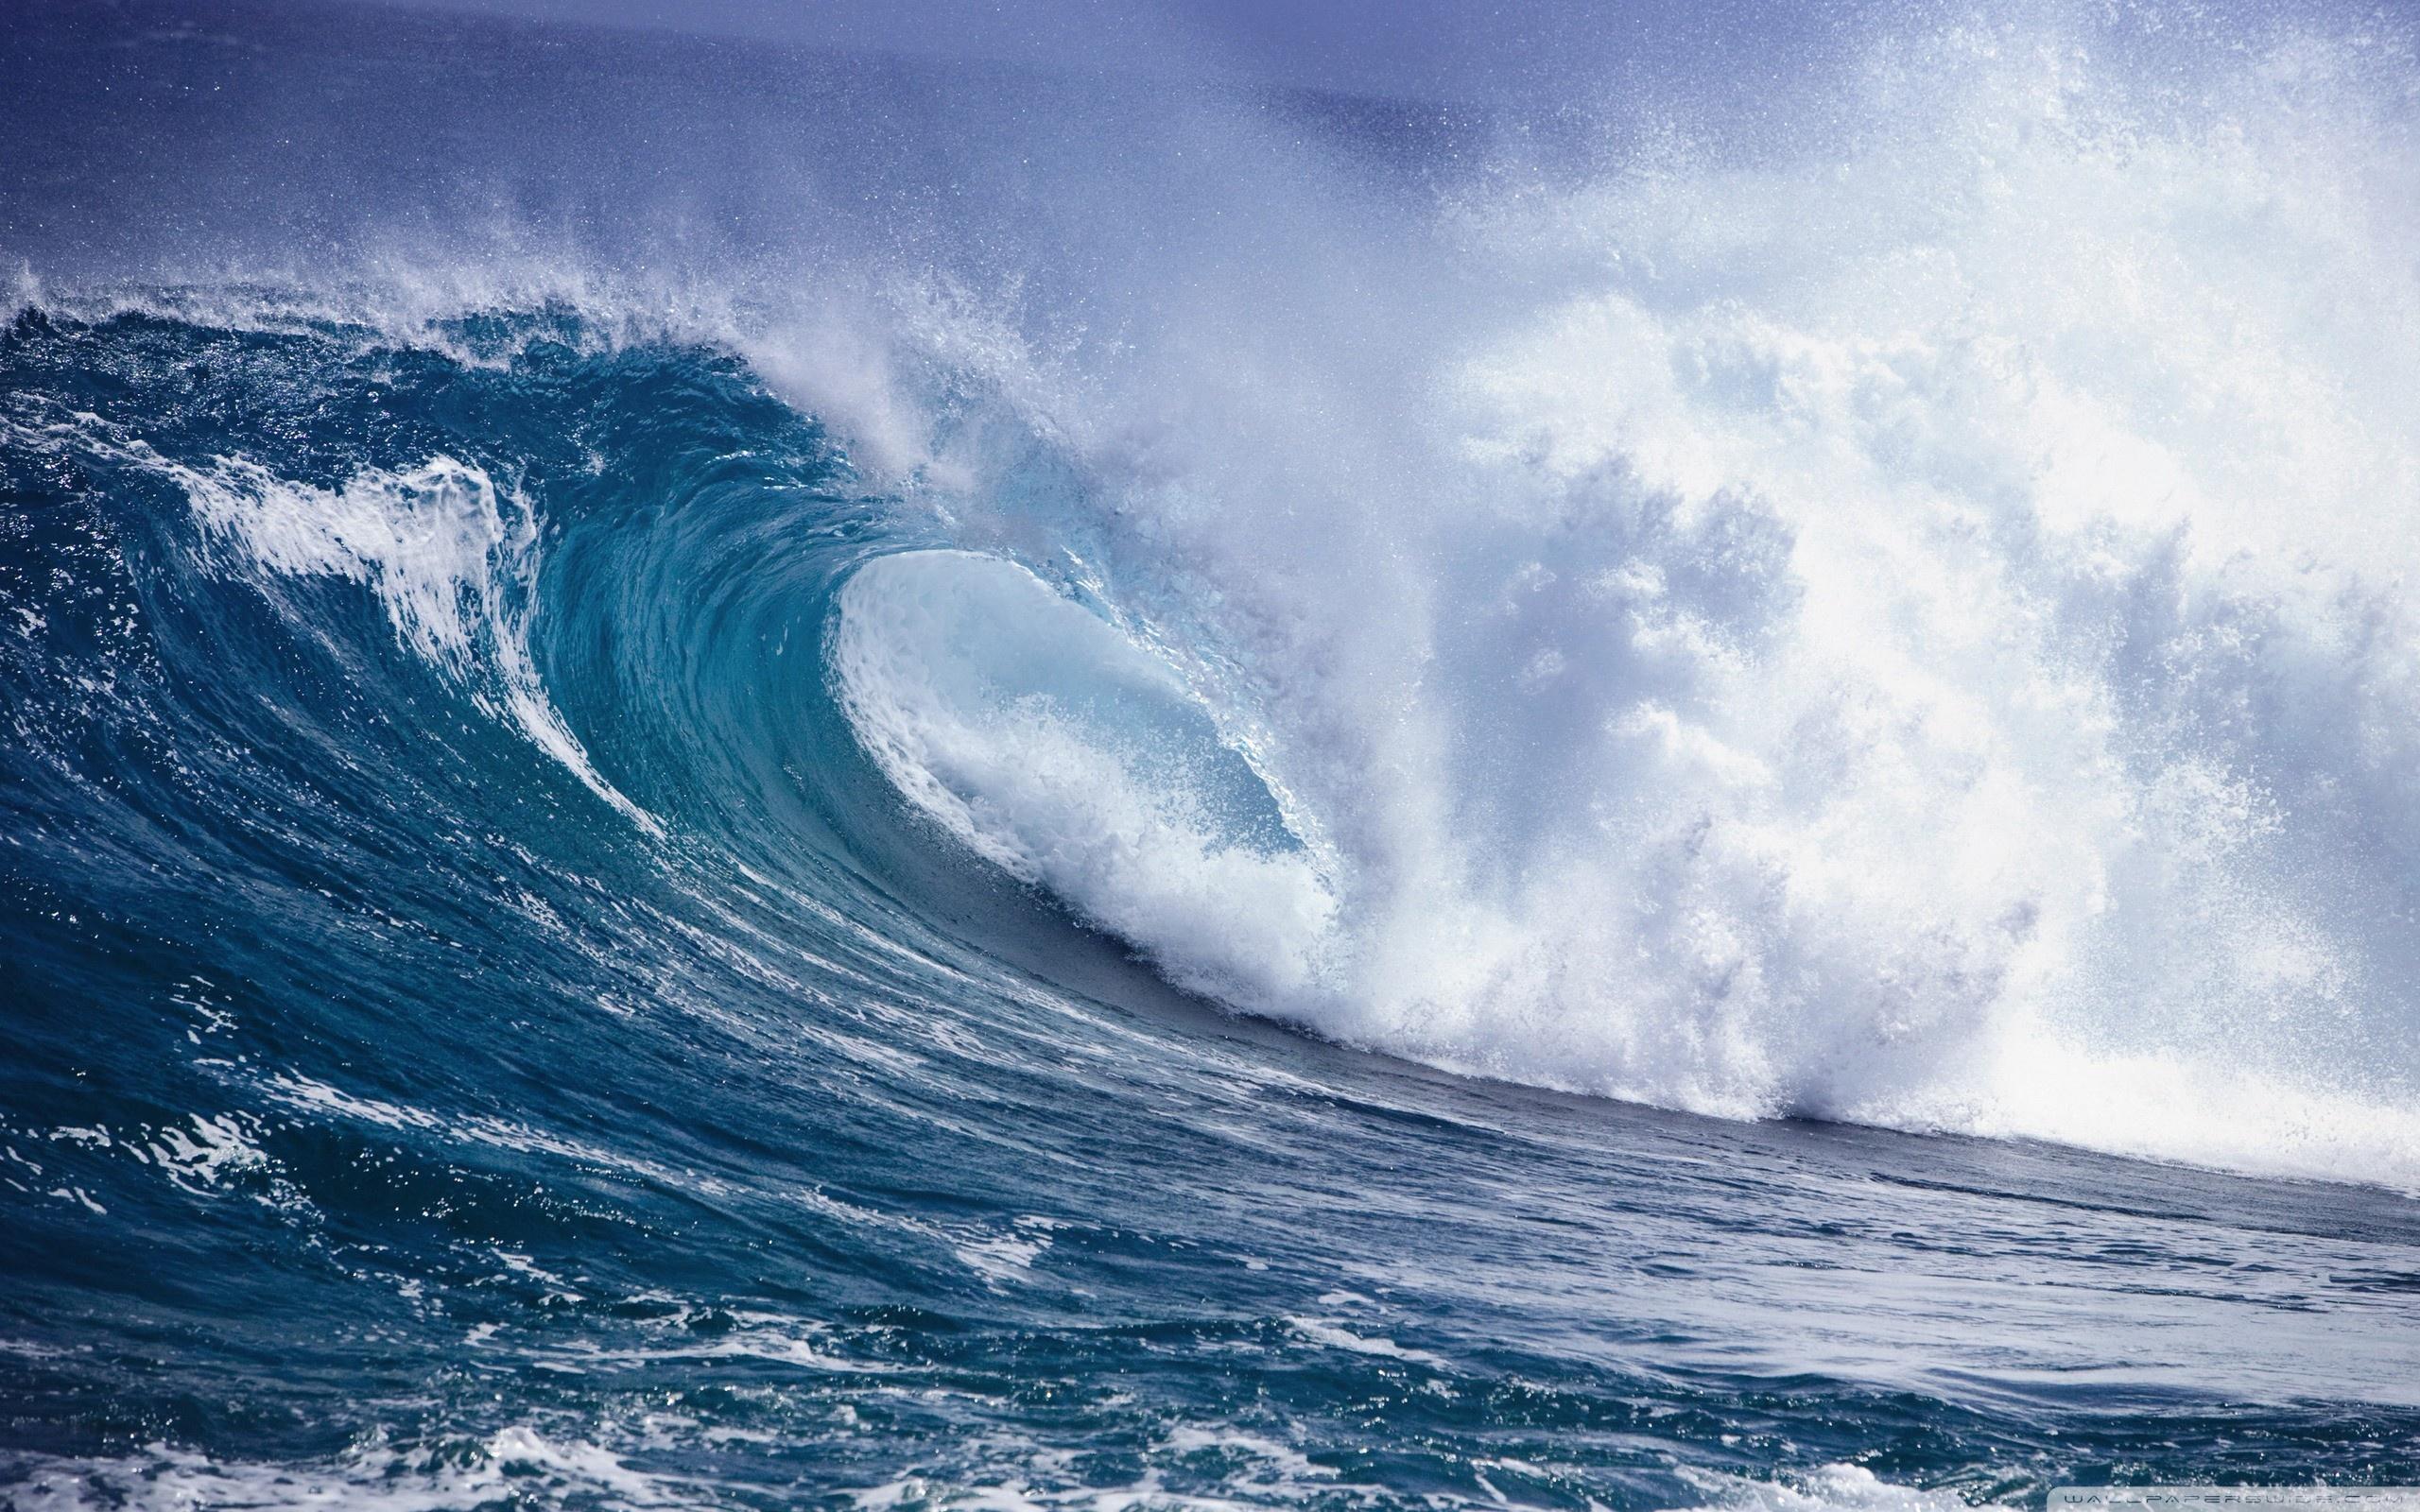 Sea Waves Wallpaper 31007 1920x1200 px